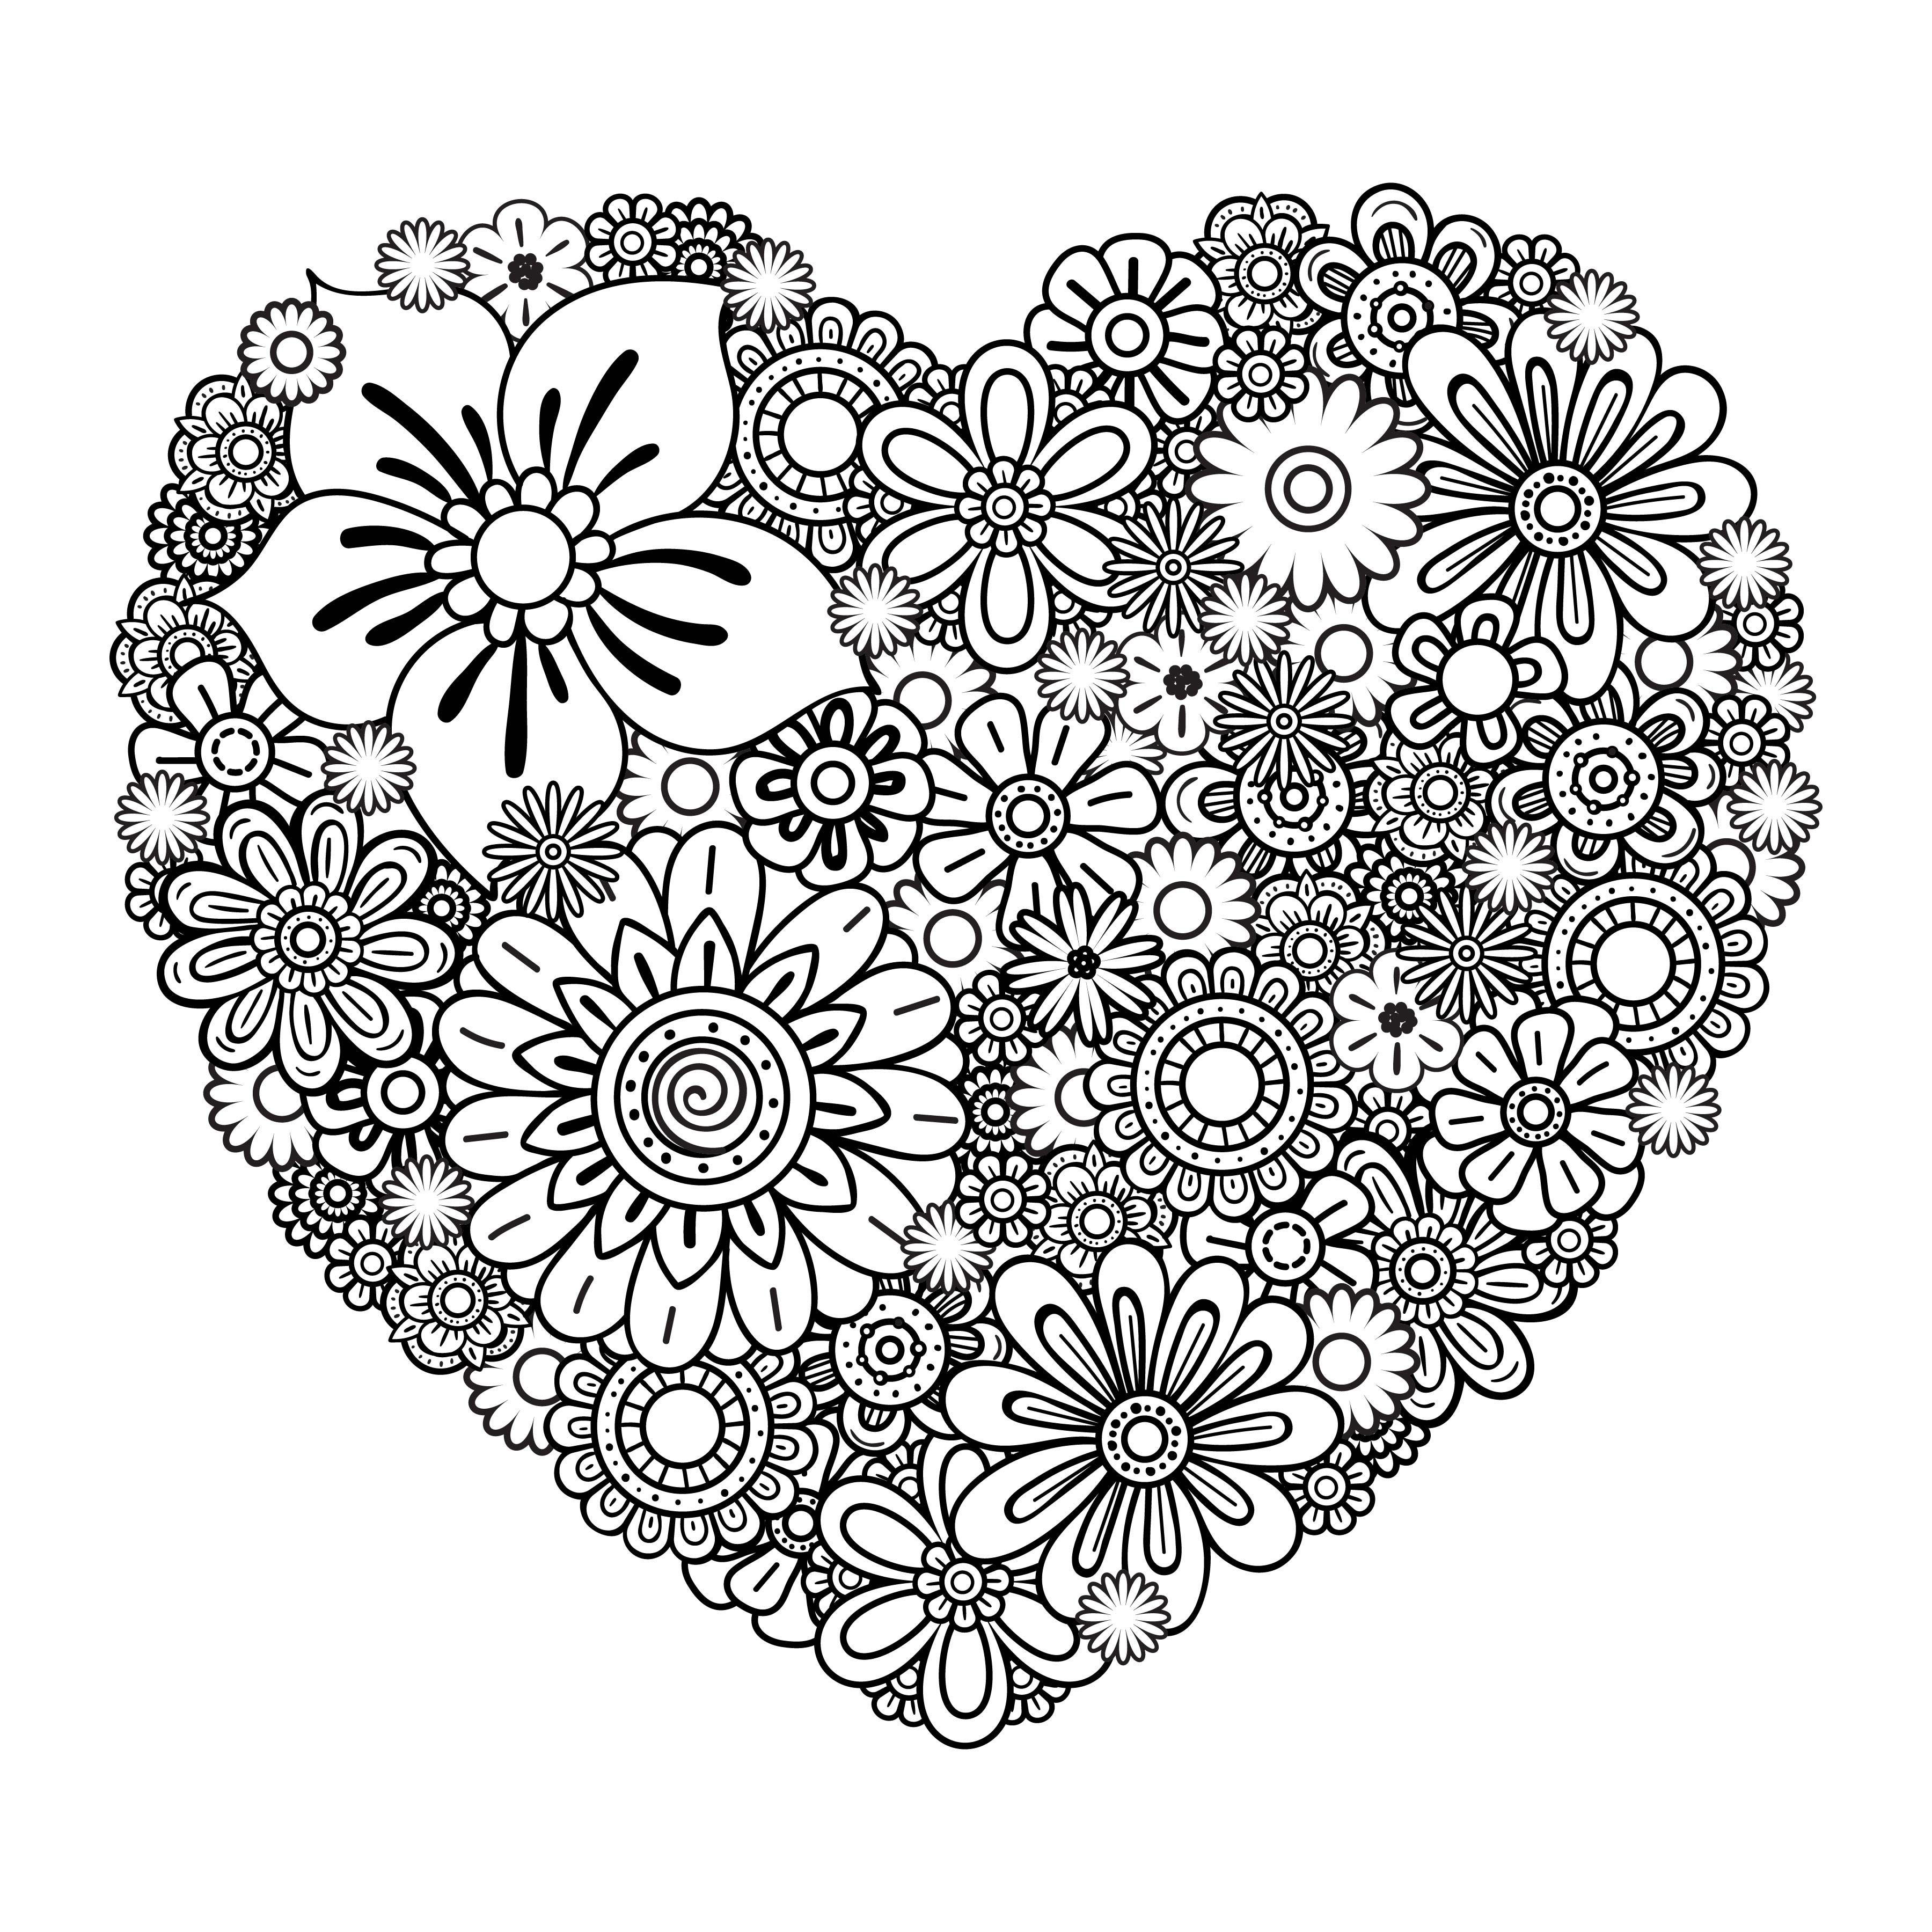 Heart SVG, Floral Heart SVG, Valentines Day Design.  Heart